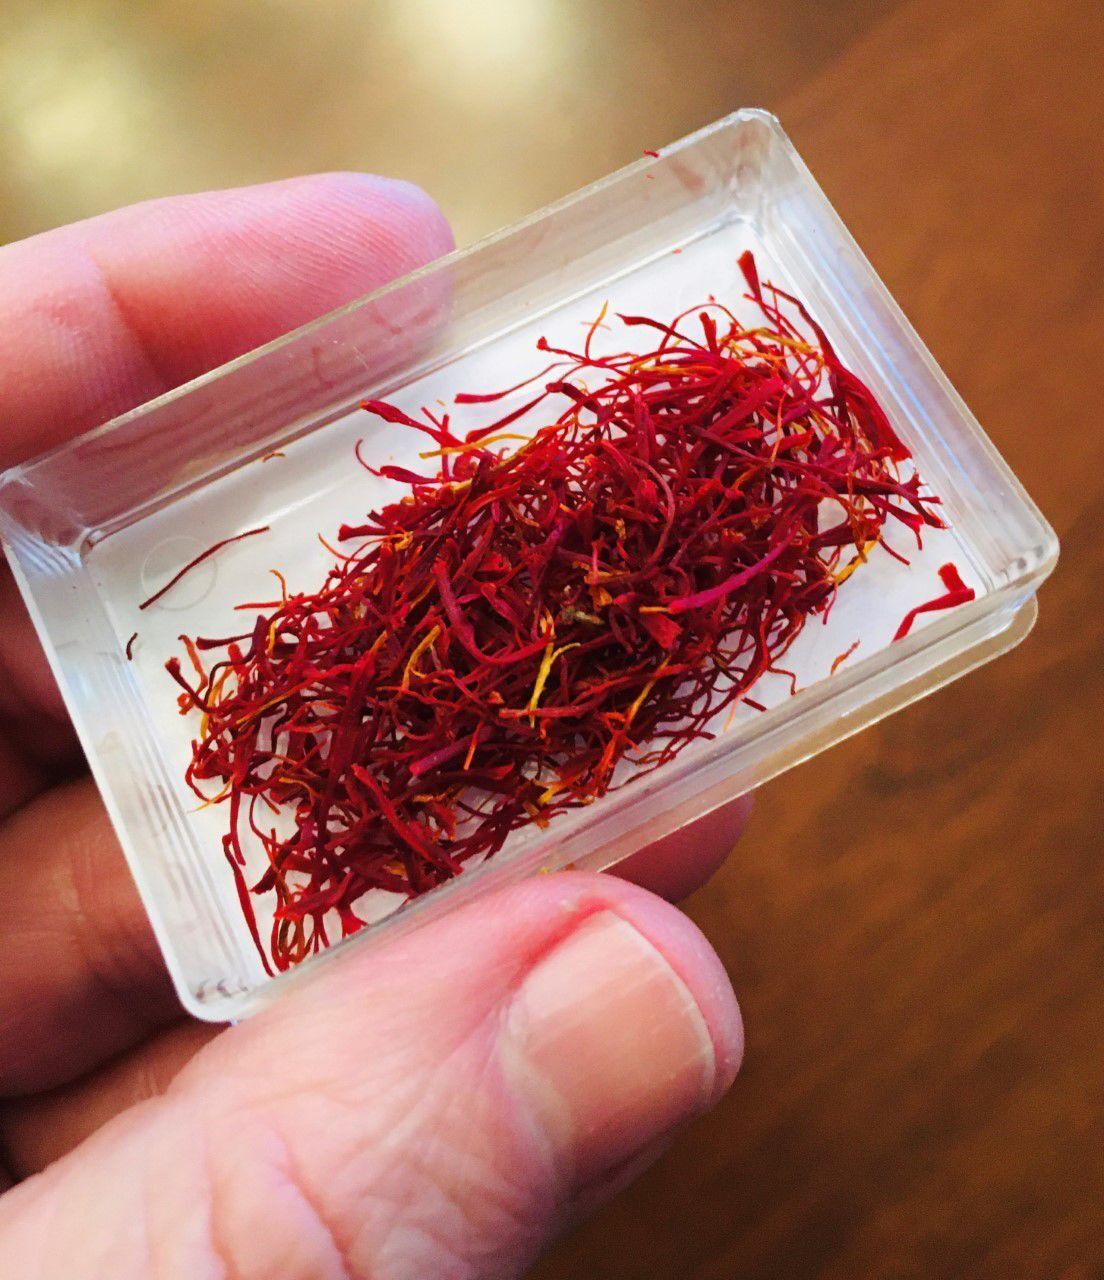 20210113-gm-foodguy_My 5 dollar pinch of saffron.jpg